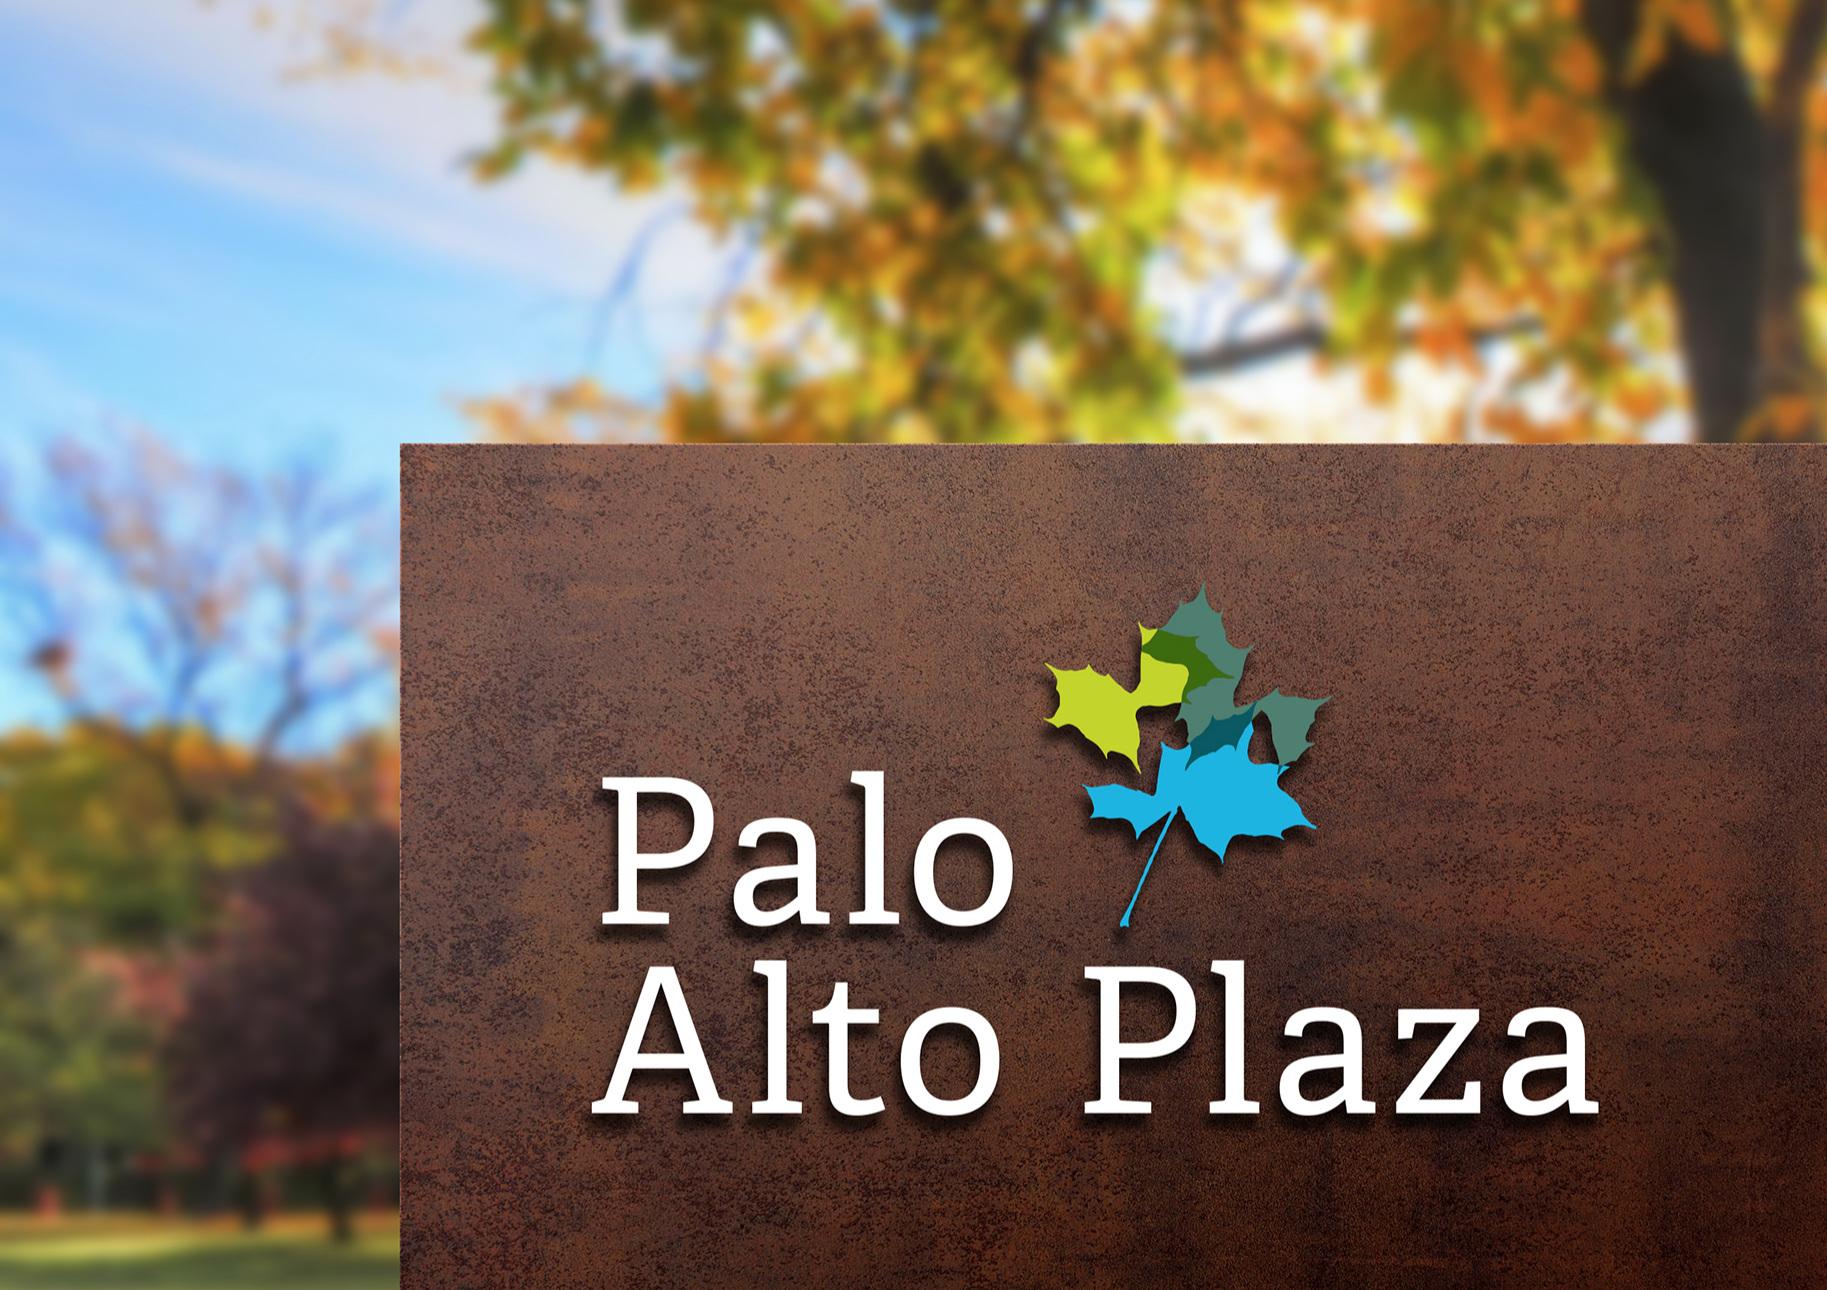 Palo+Alto+Plaza+Sign+Mockup.jpg